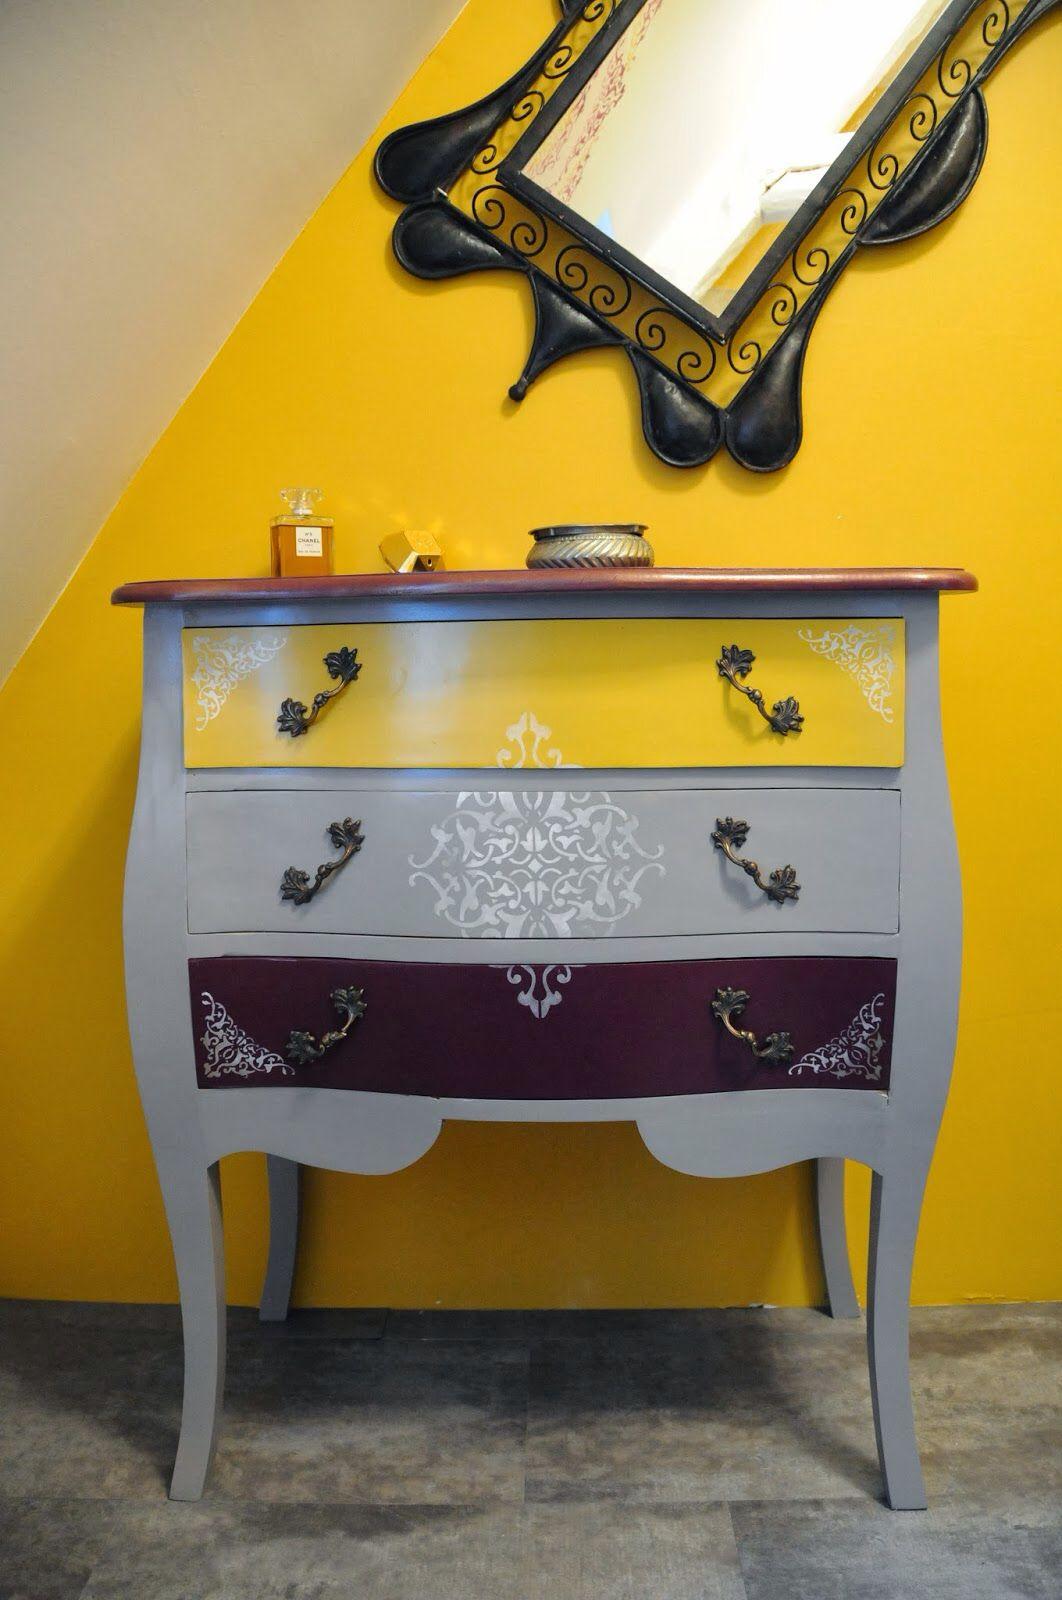 cr ation les patines d 39 elise blog mon style pinterest. Black Bedroom Furniture Sets. Home Design Ideas